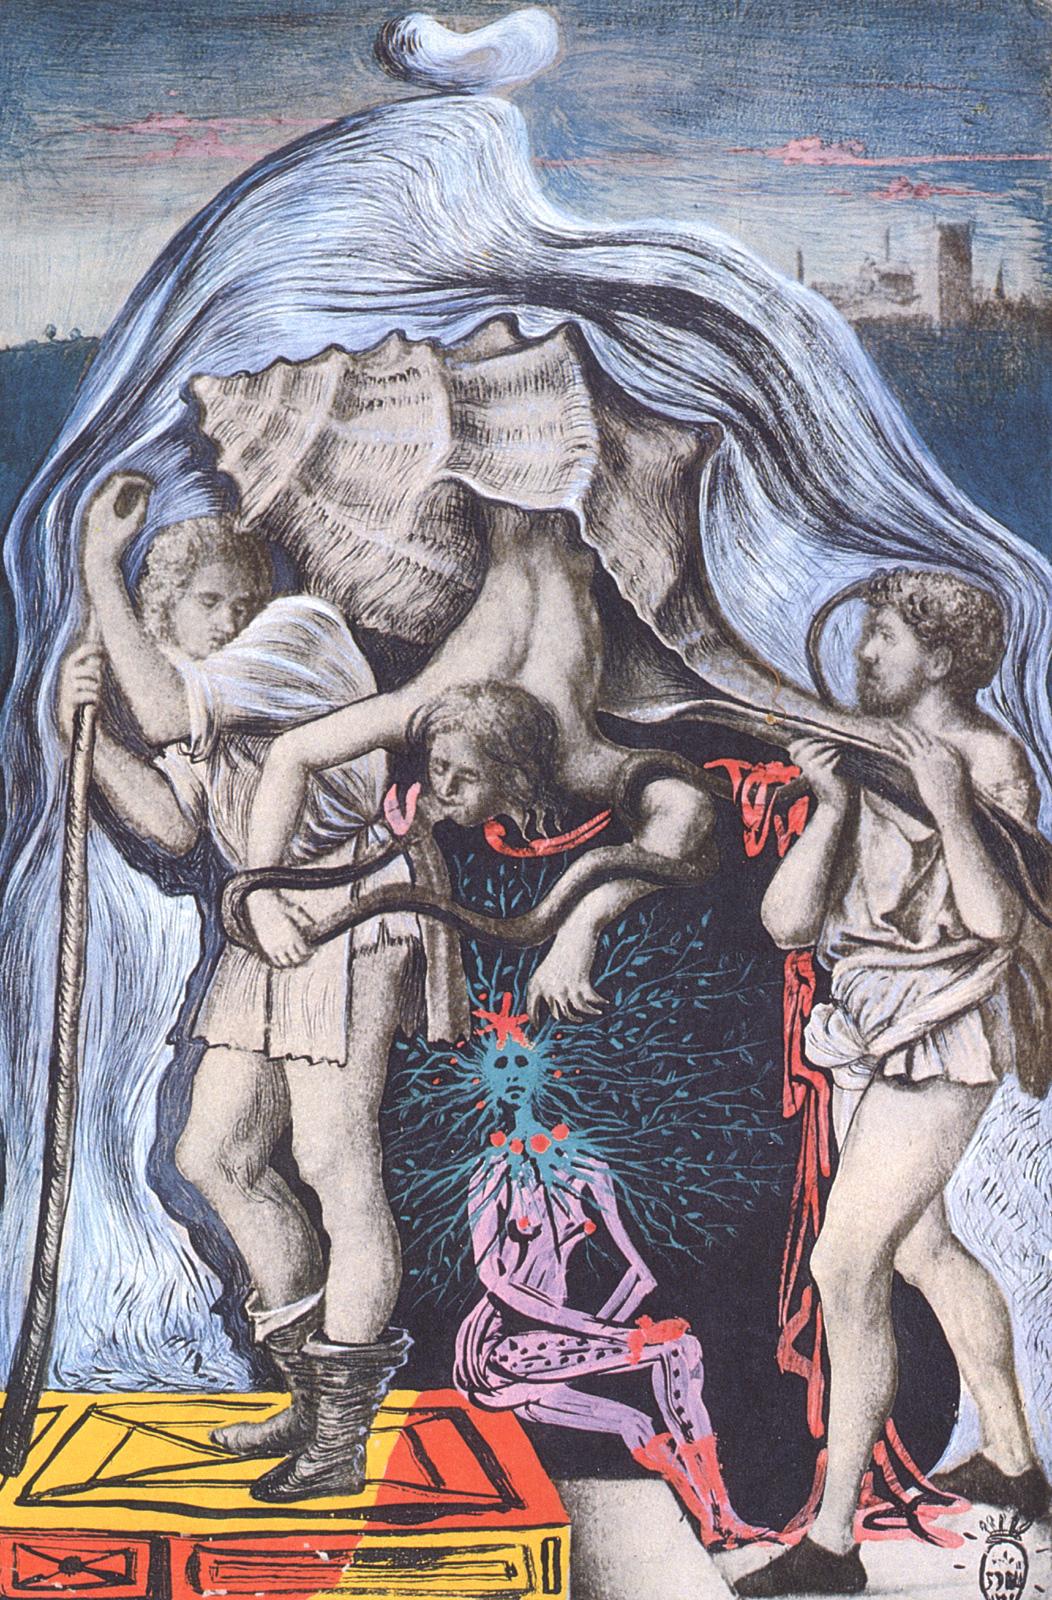 Metamorphosis of the Five Allegories of Giovanni Bellini, 1939